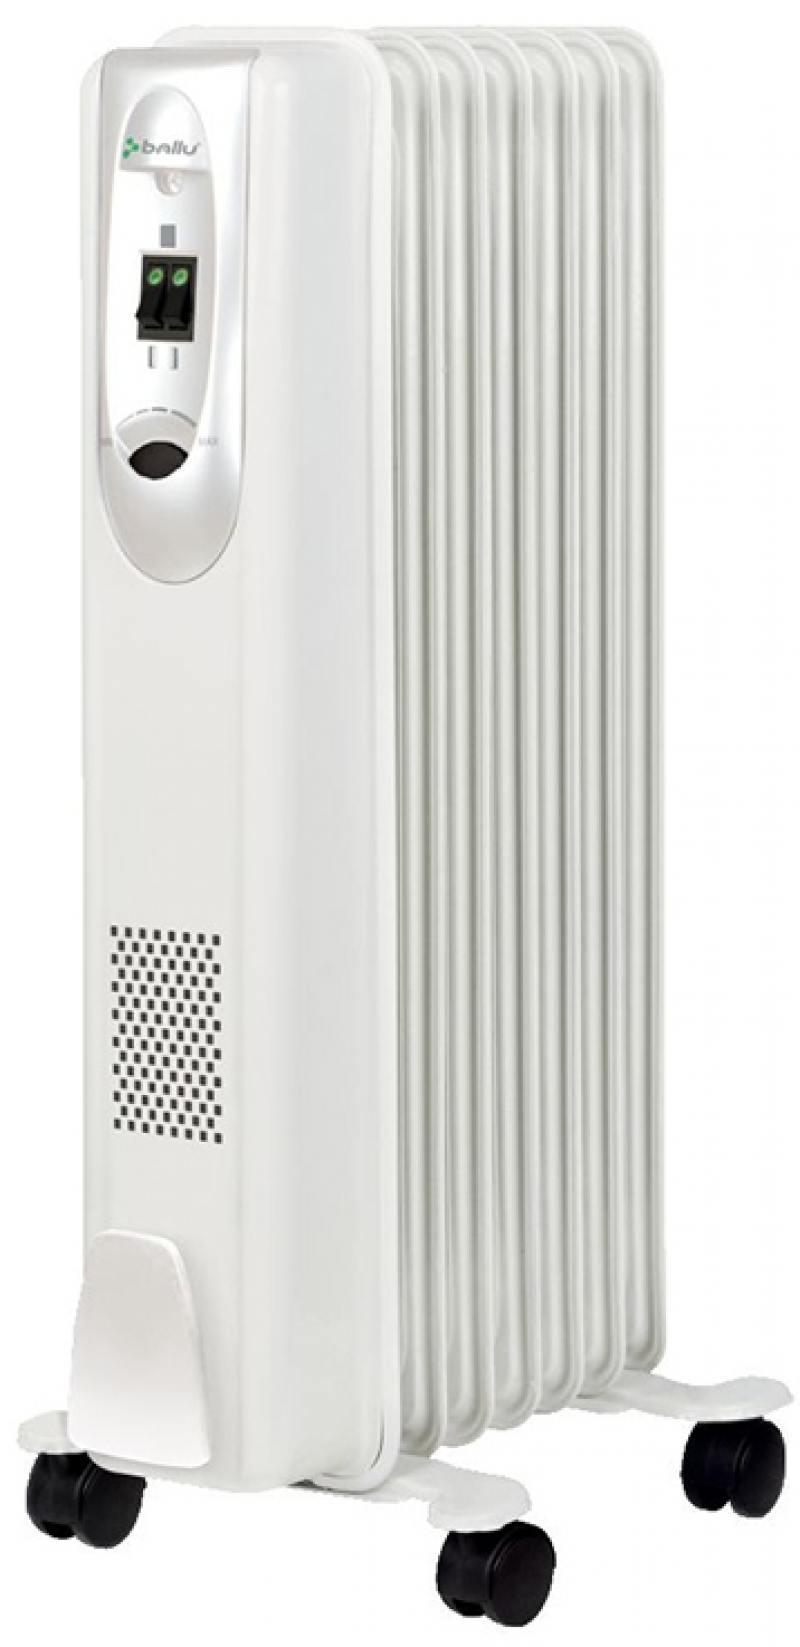 Масляный радиатор BALLU Comfort BOH/CM-07WDN 1500 Вт белый масляный радиатор ballu comfort 1000 вт белый boh cm 05wdn